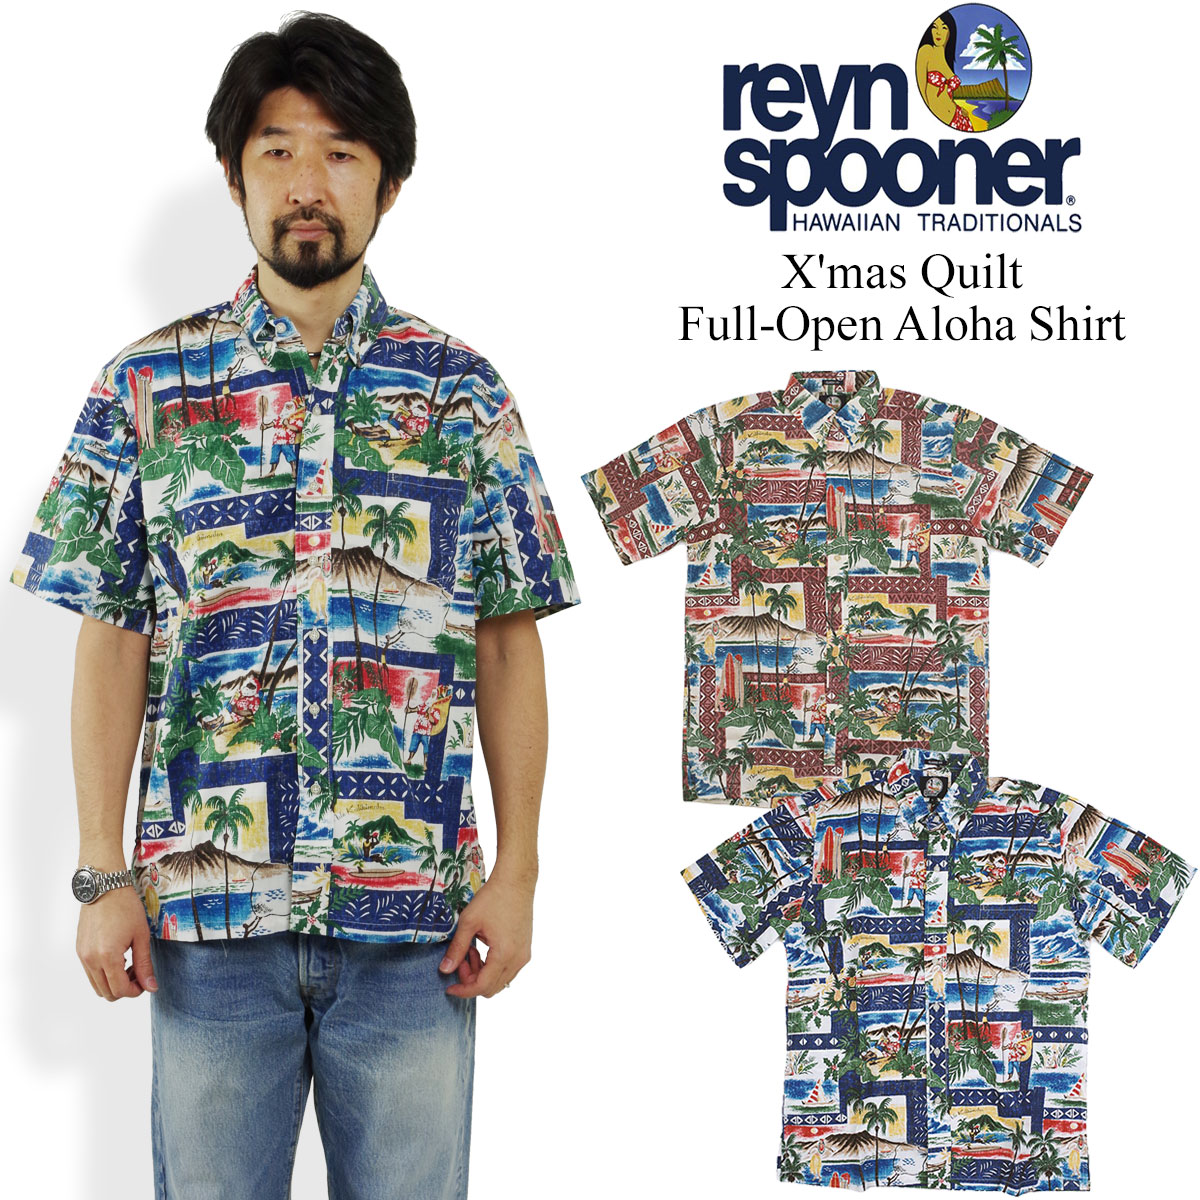 Christmas Hawaiian Shirt.レインスプーナー Reyn Spooner Short Sleeves Full Opening Hawaiian Shirt Hawaii Ann Christmas Pattern Christmas Limited On Hawaian Christmas